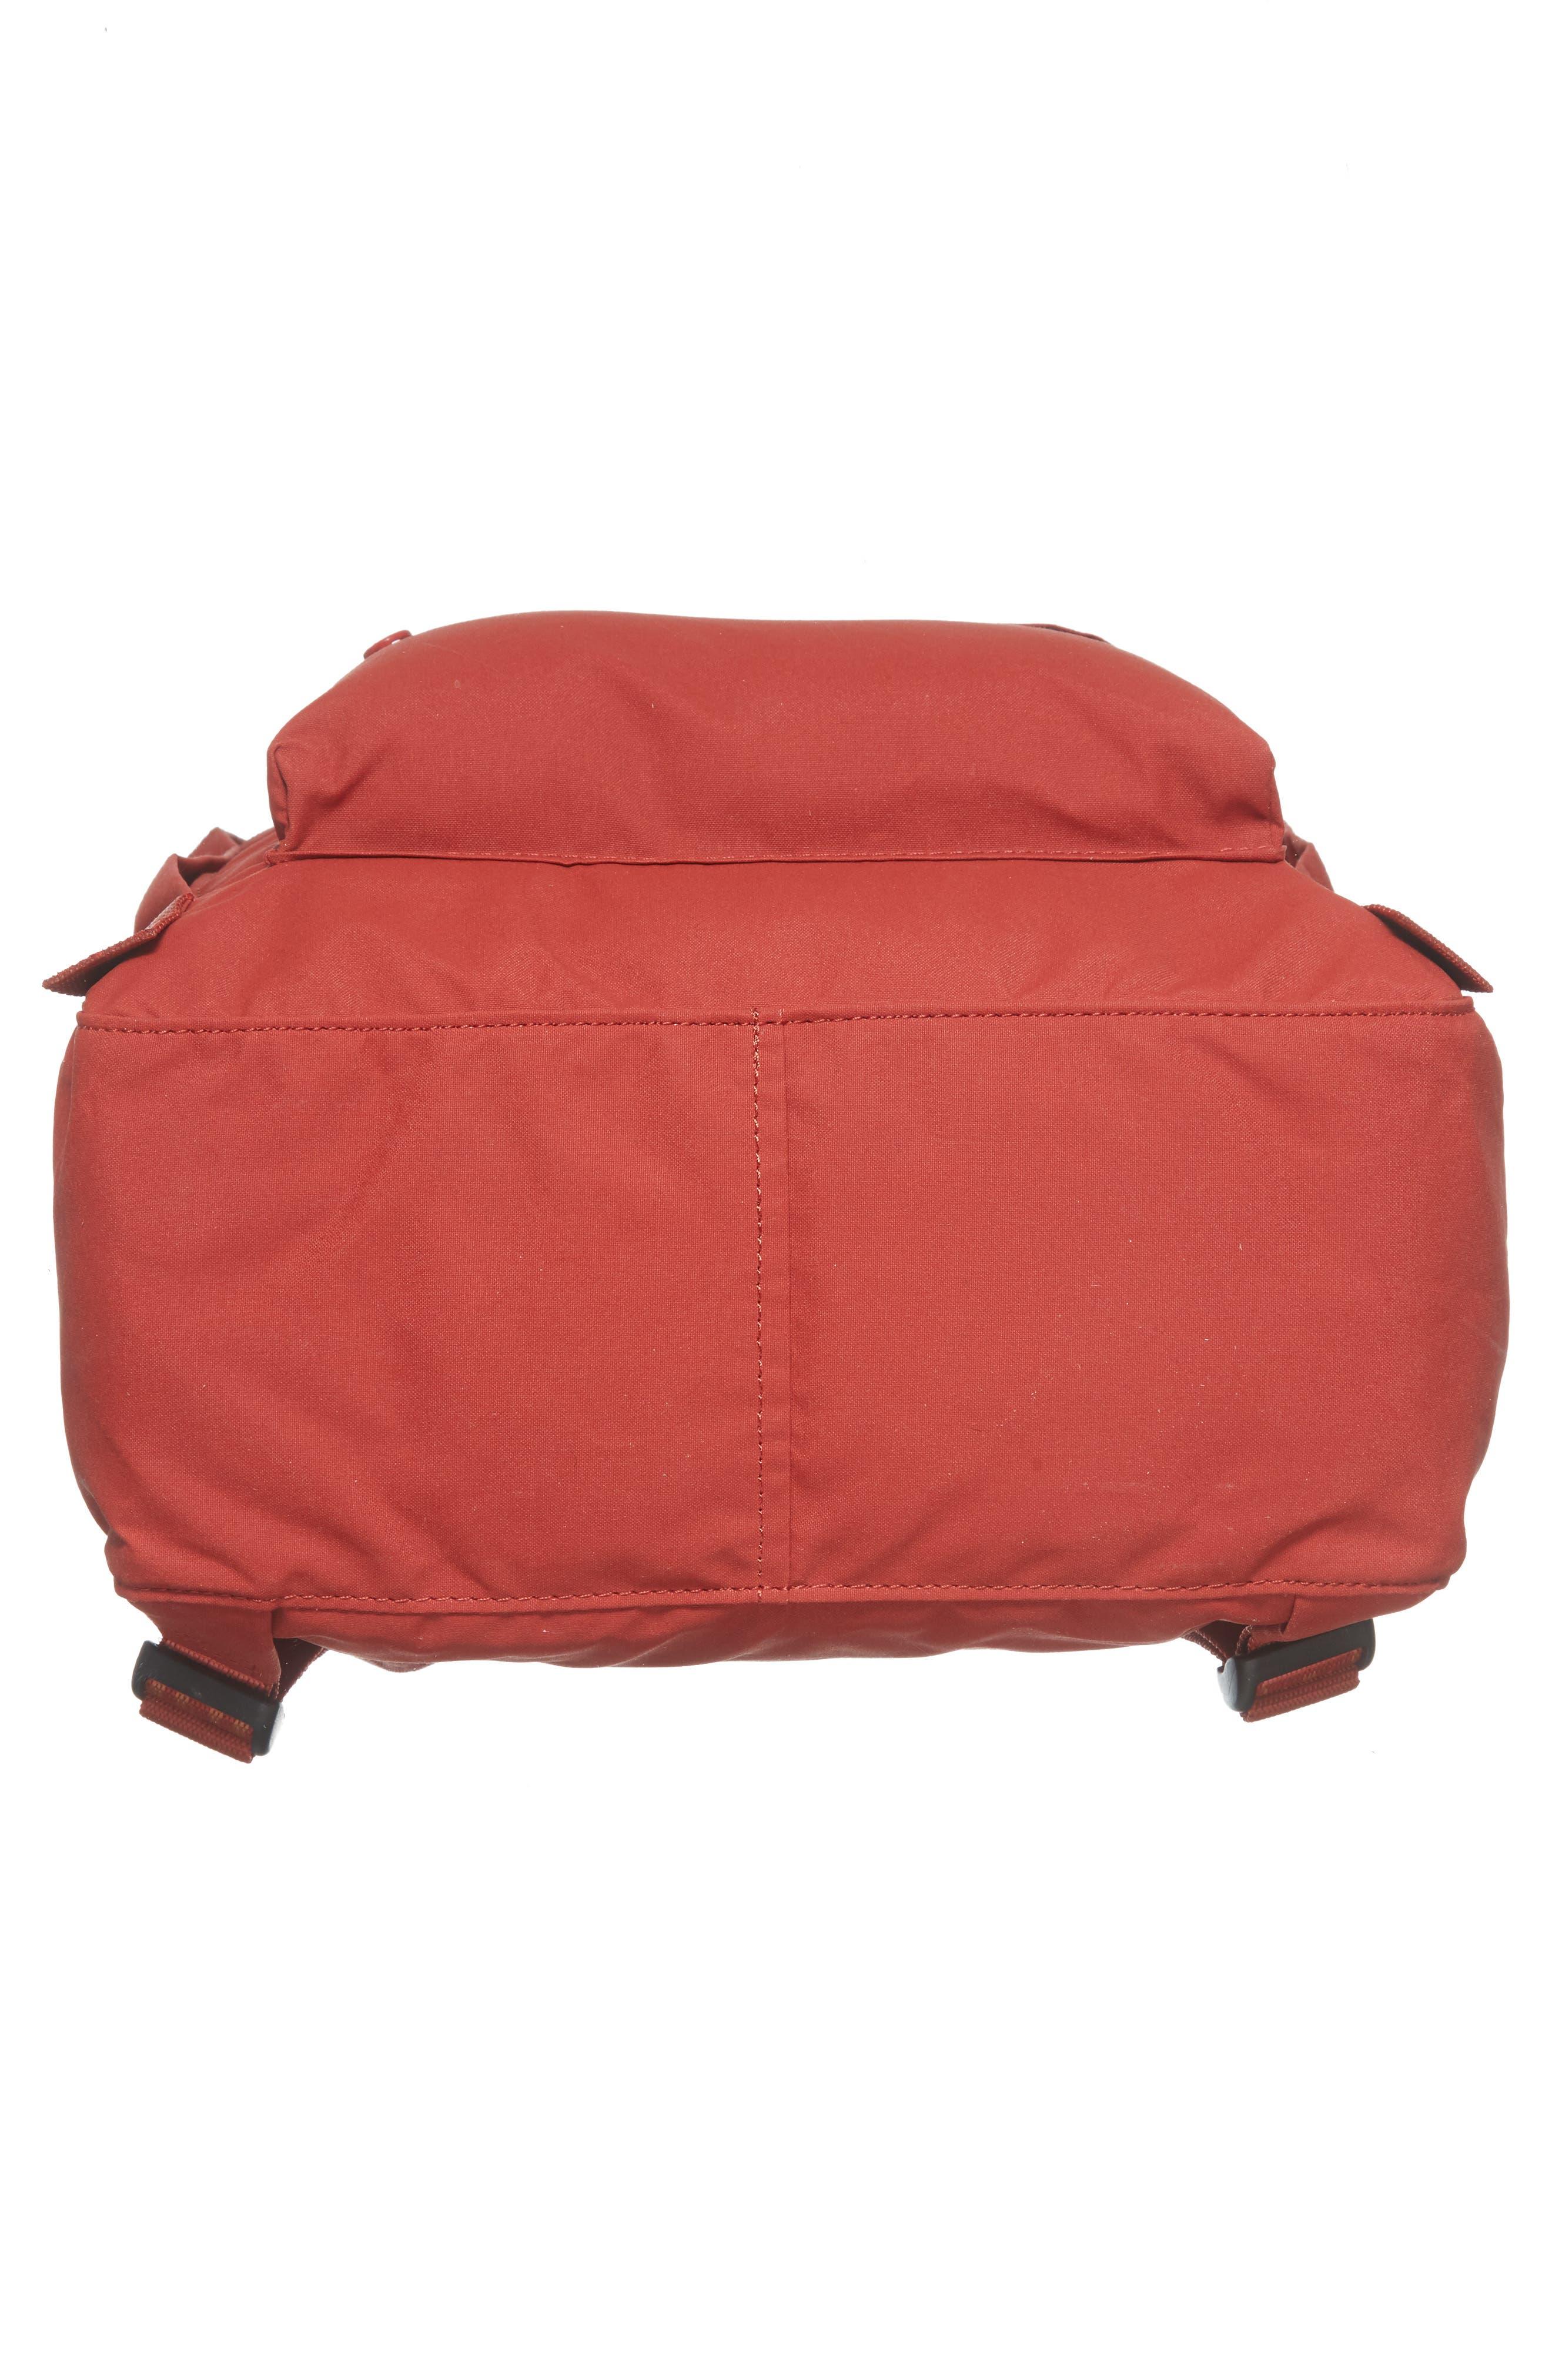 'Kånken' Water Resistant Backpack,                             Alternate thumbnail 317, color,